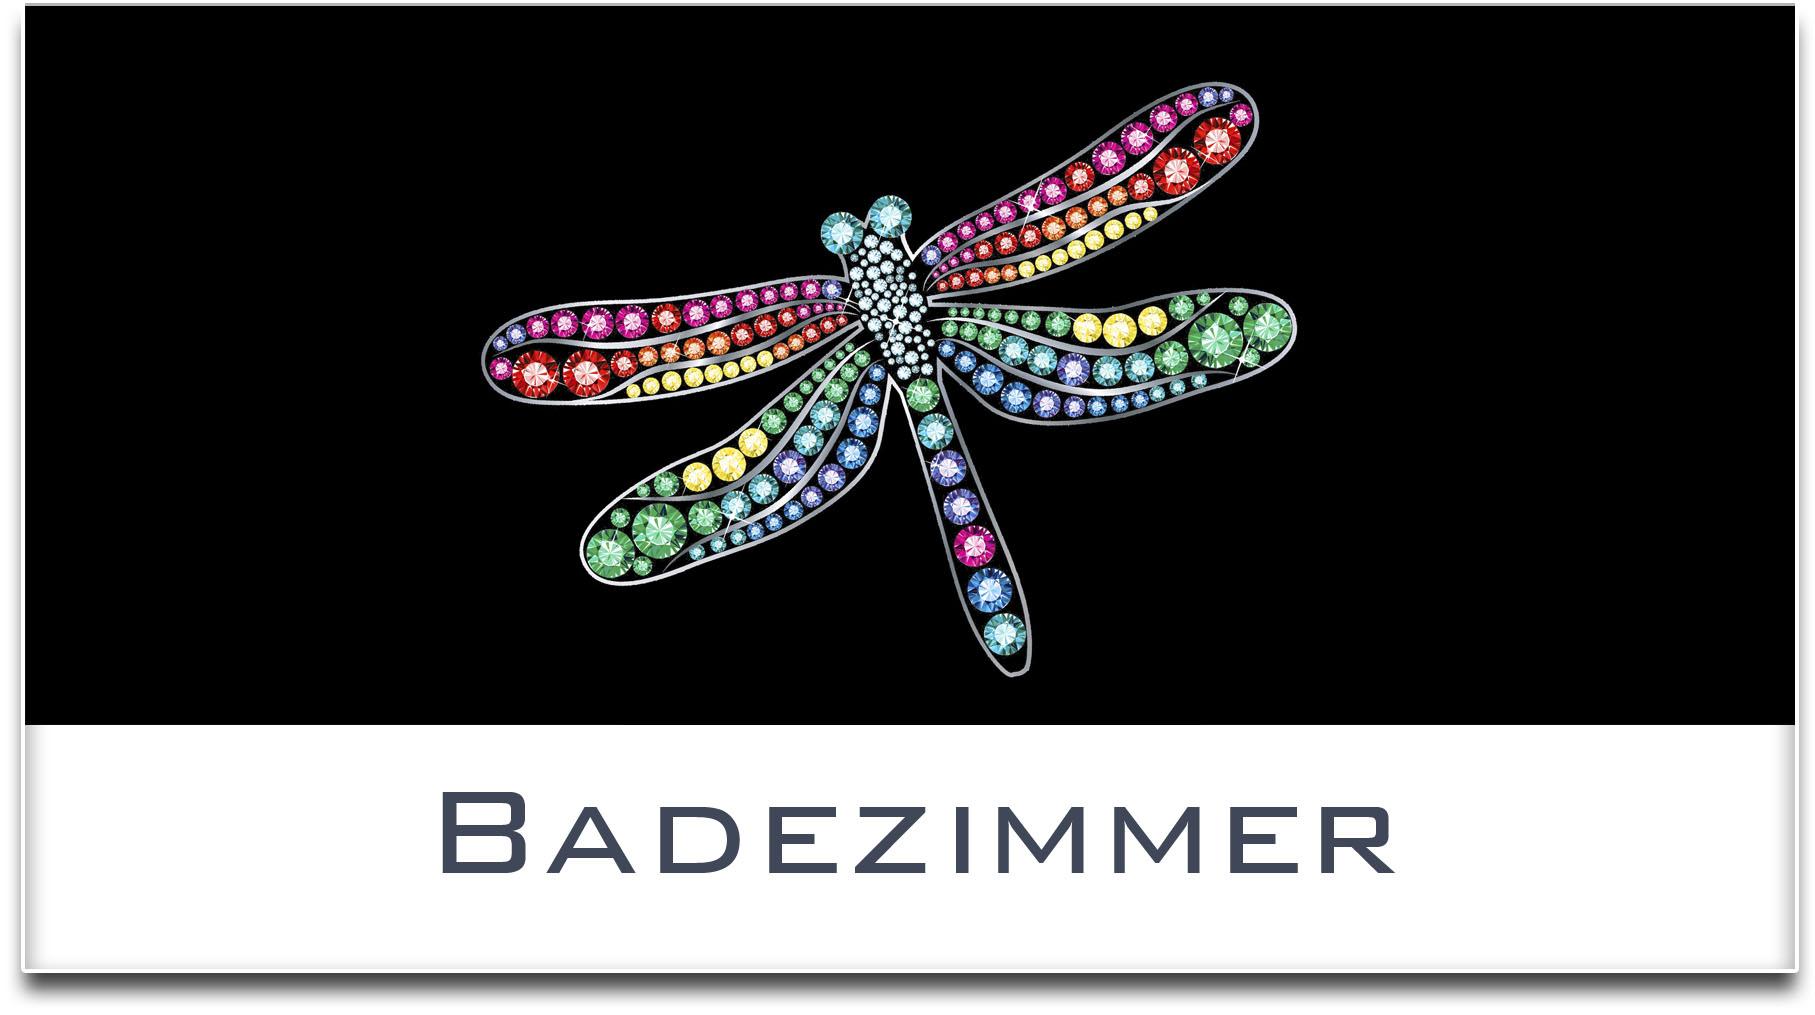 Türschild / Haustürschild / Libelle / Badezimmer / Selbstklebend